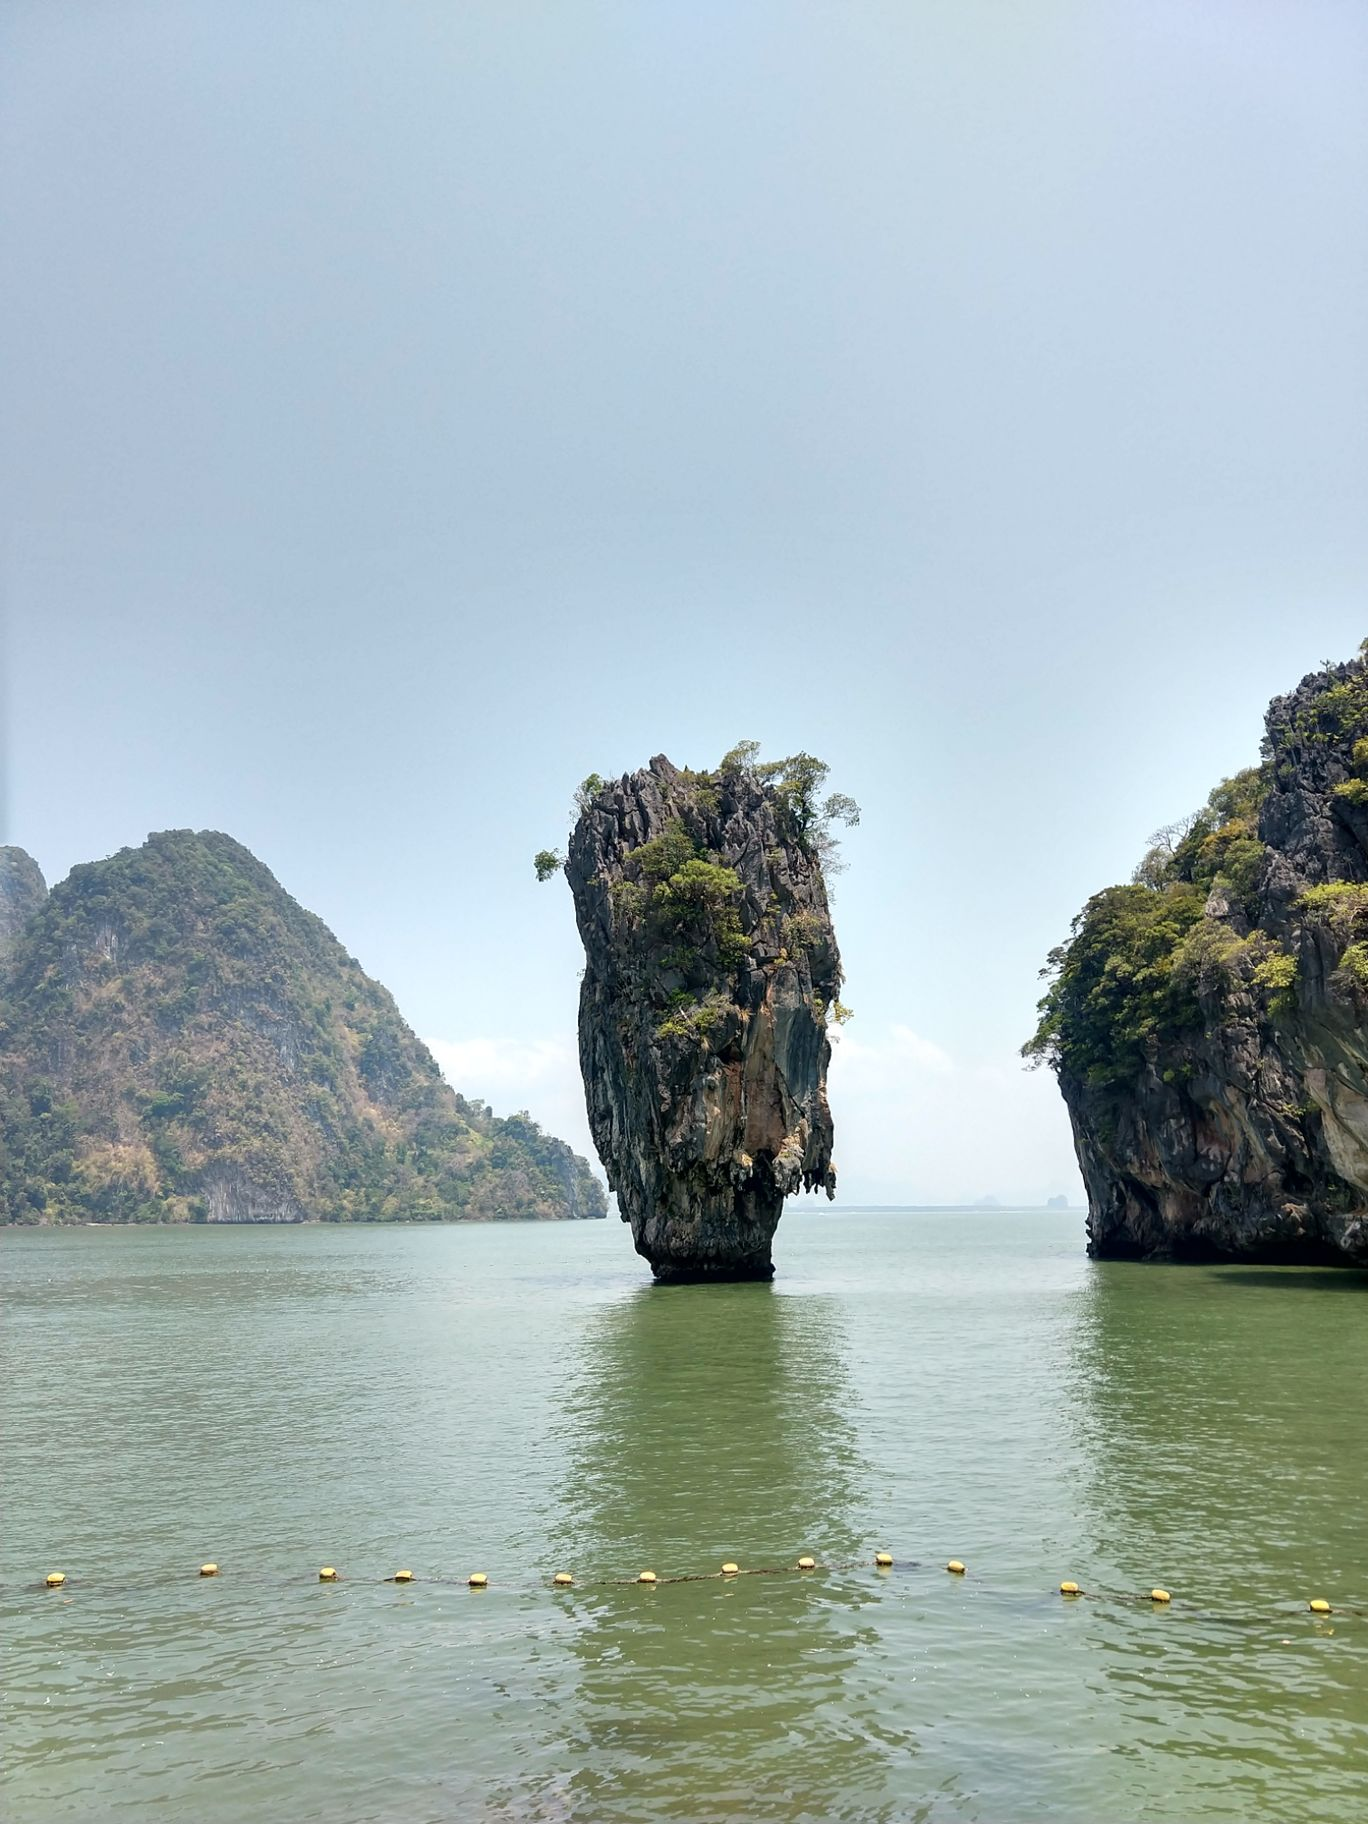 Photo of James Bond Island By Rahul Chauhan